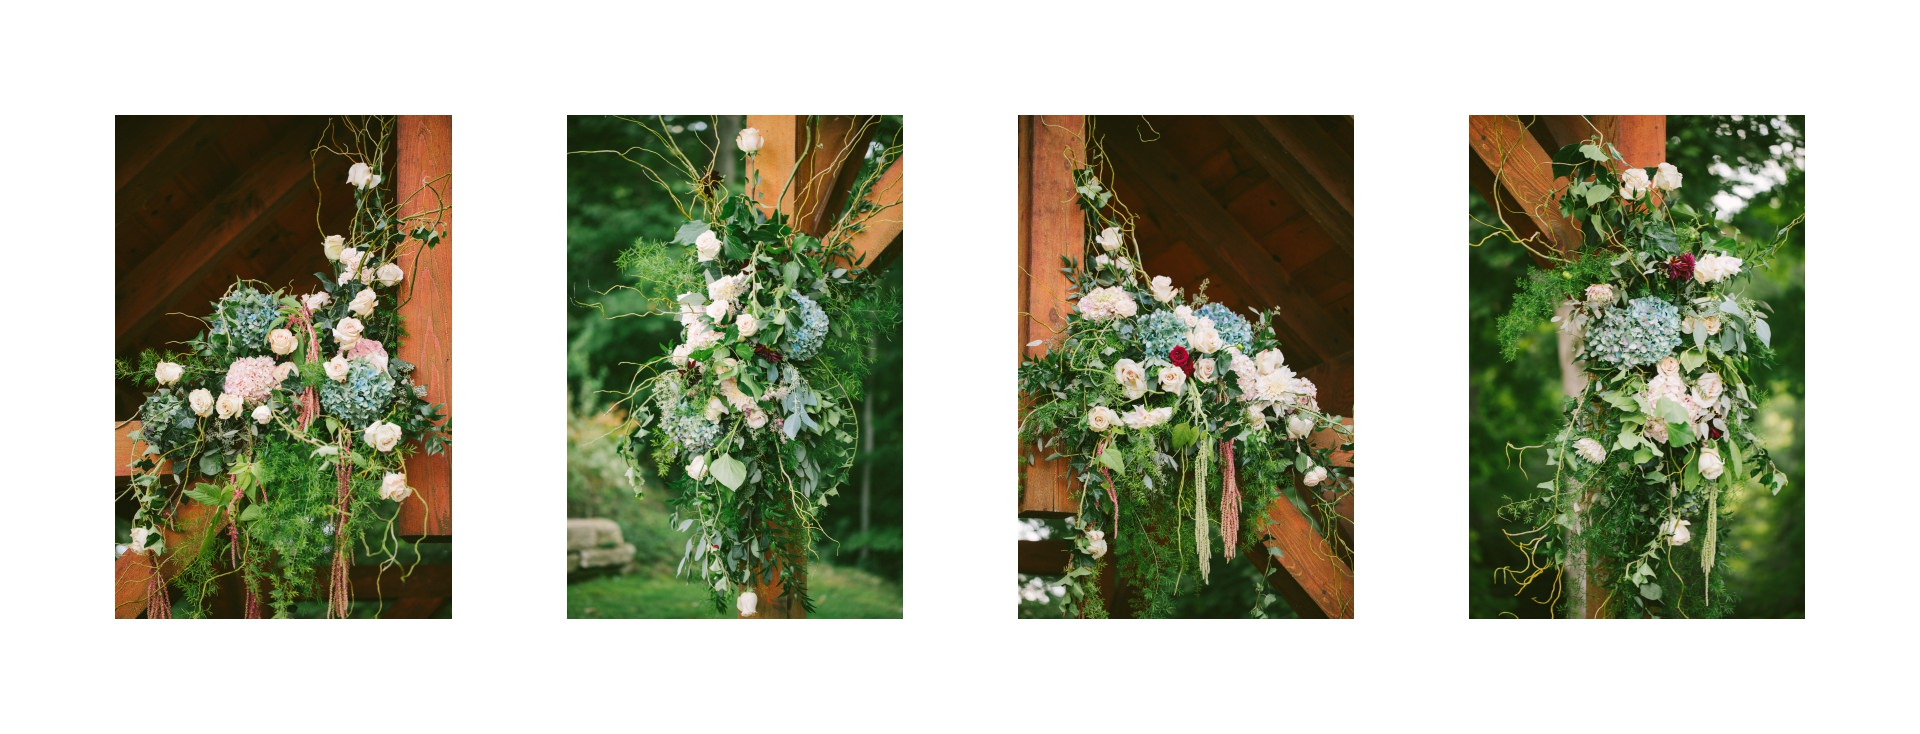 Meadow Ridge Farm Wedding Photos in Windsor 2 11.jpg